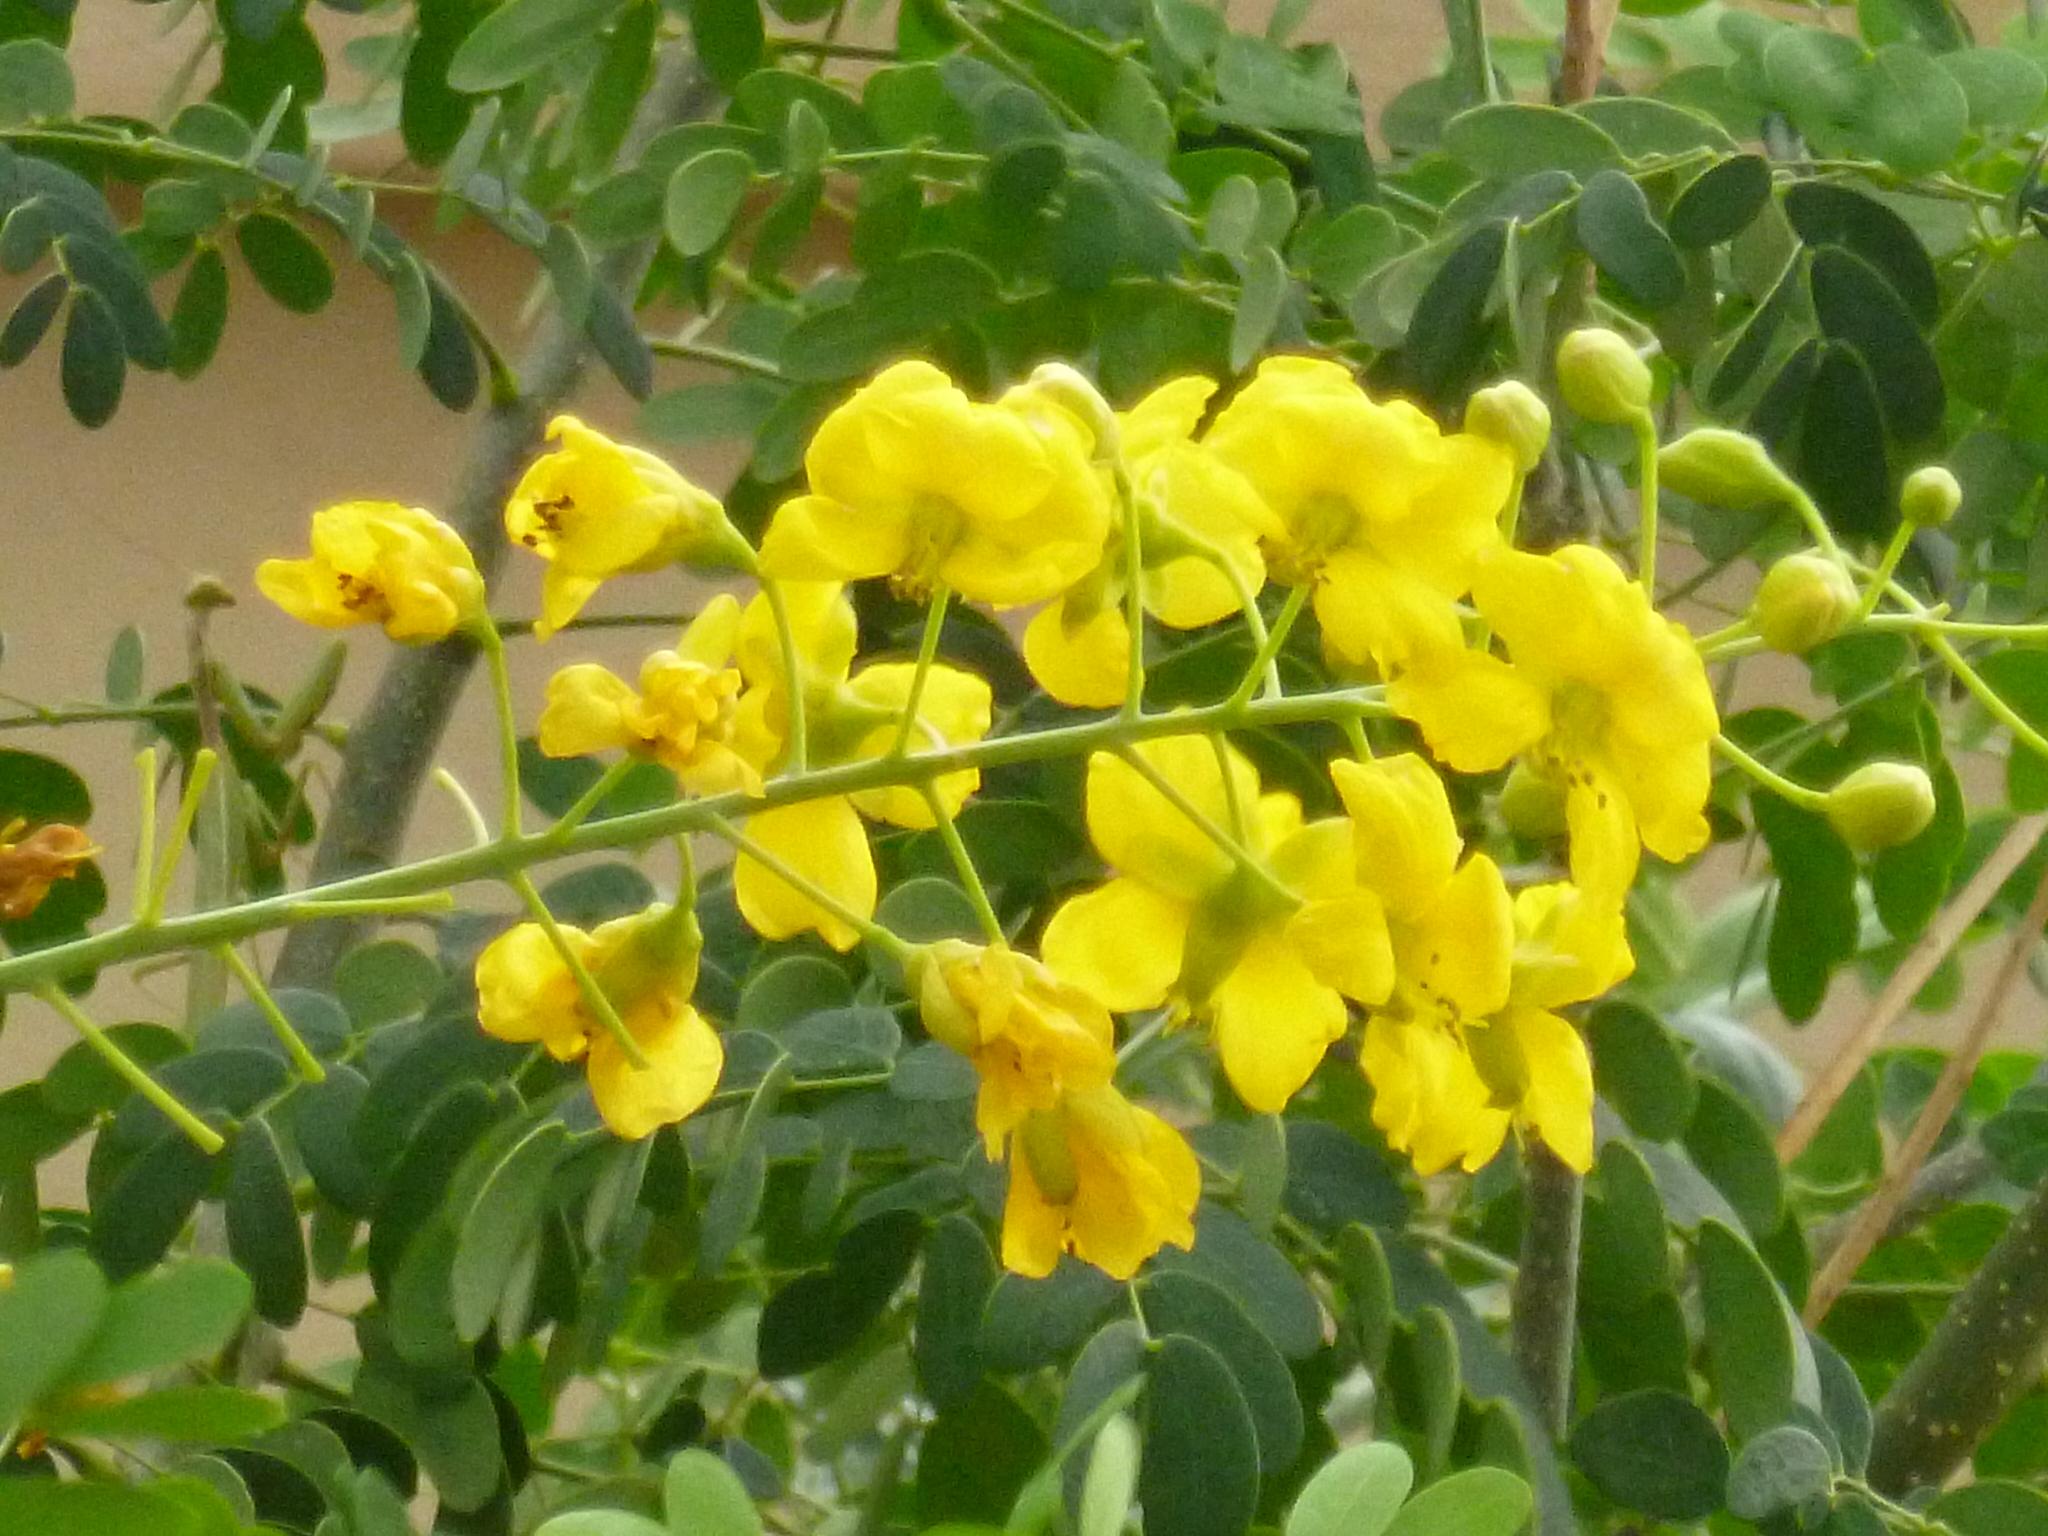 Yellow flower names abutilon reventum indian mallow yellow indian names of yellow flowers high resolution wallpaper mightylinksfo